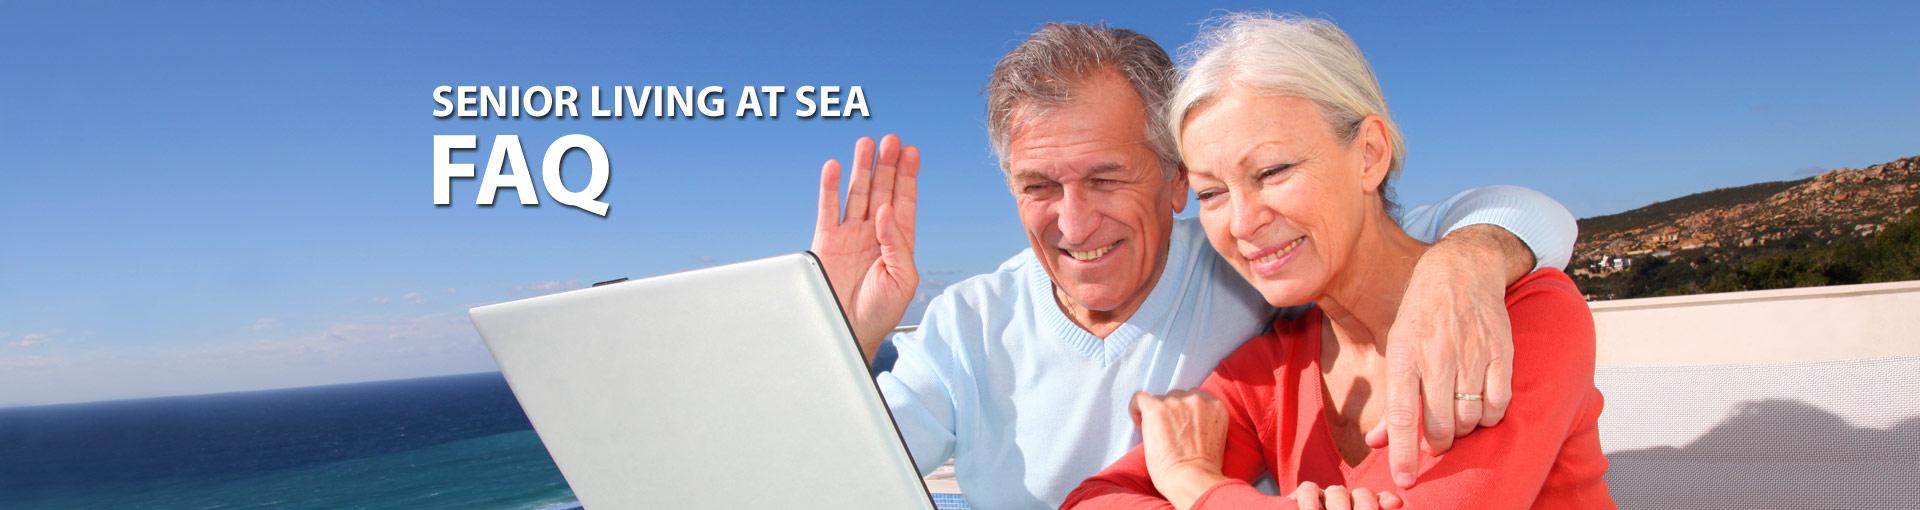 Senior Living at Sea FAQ